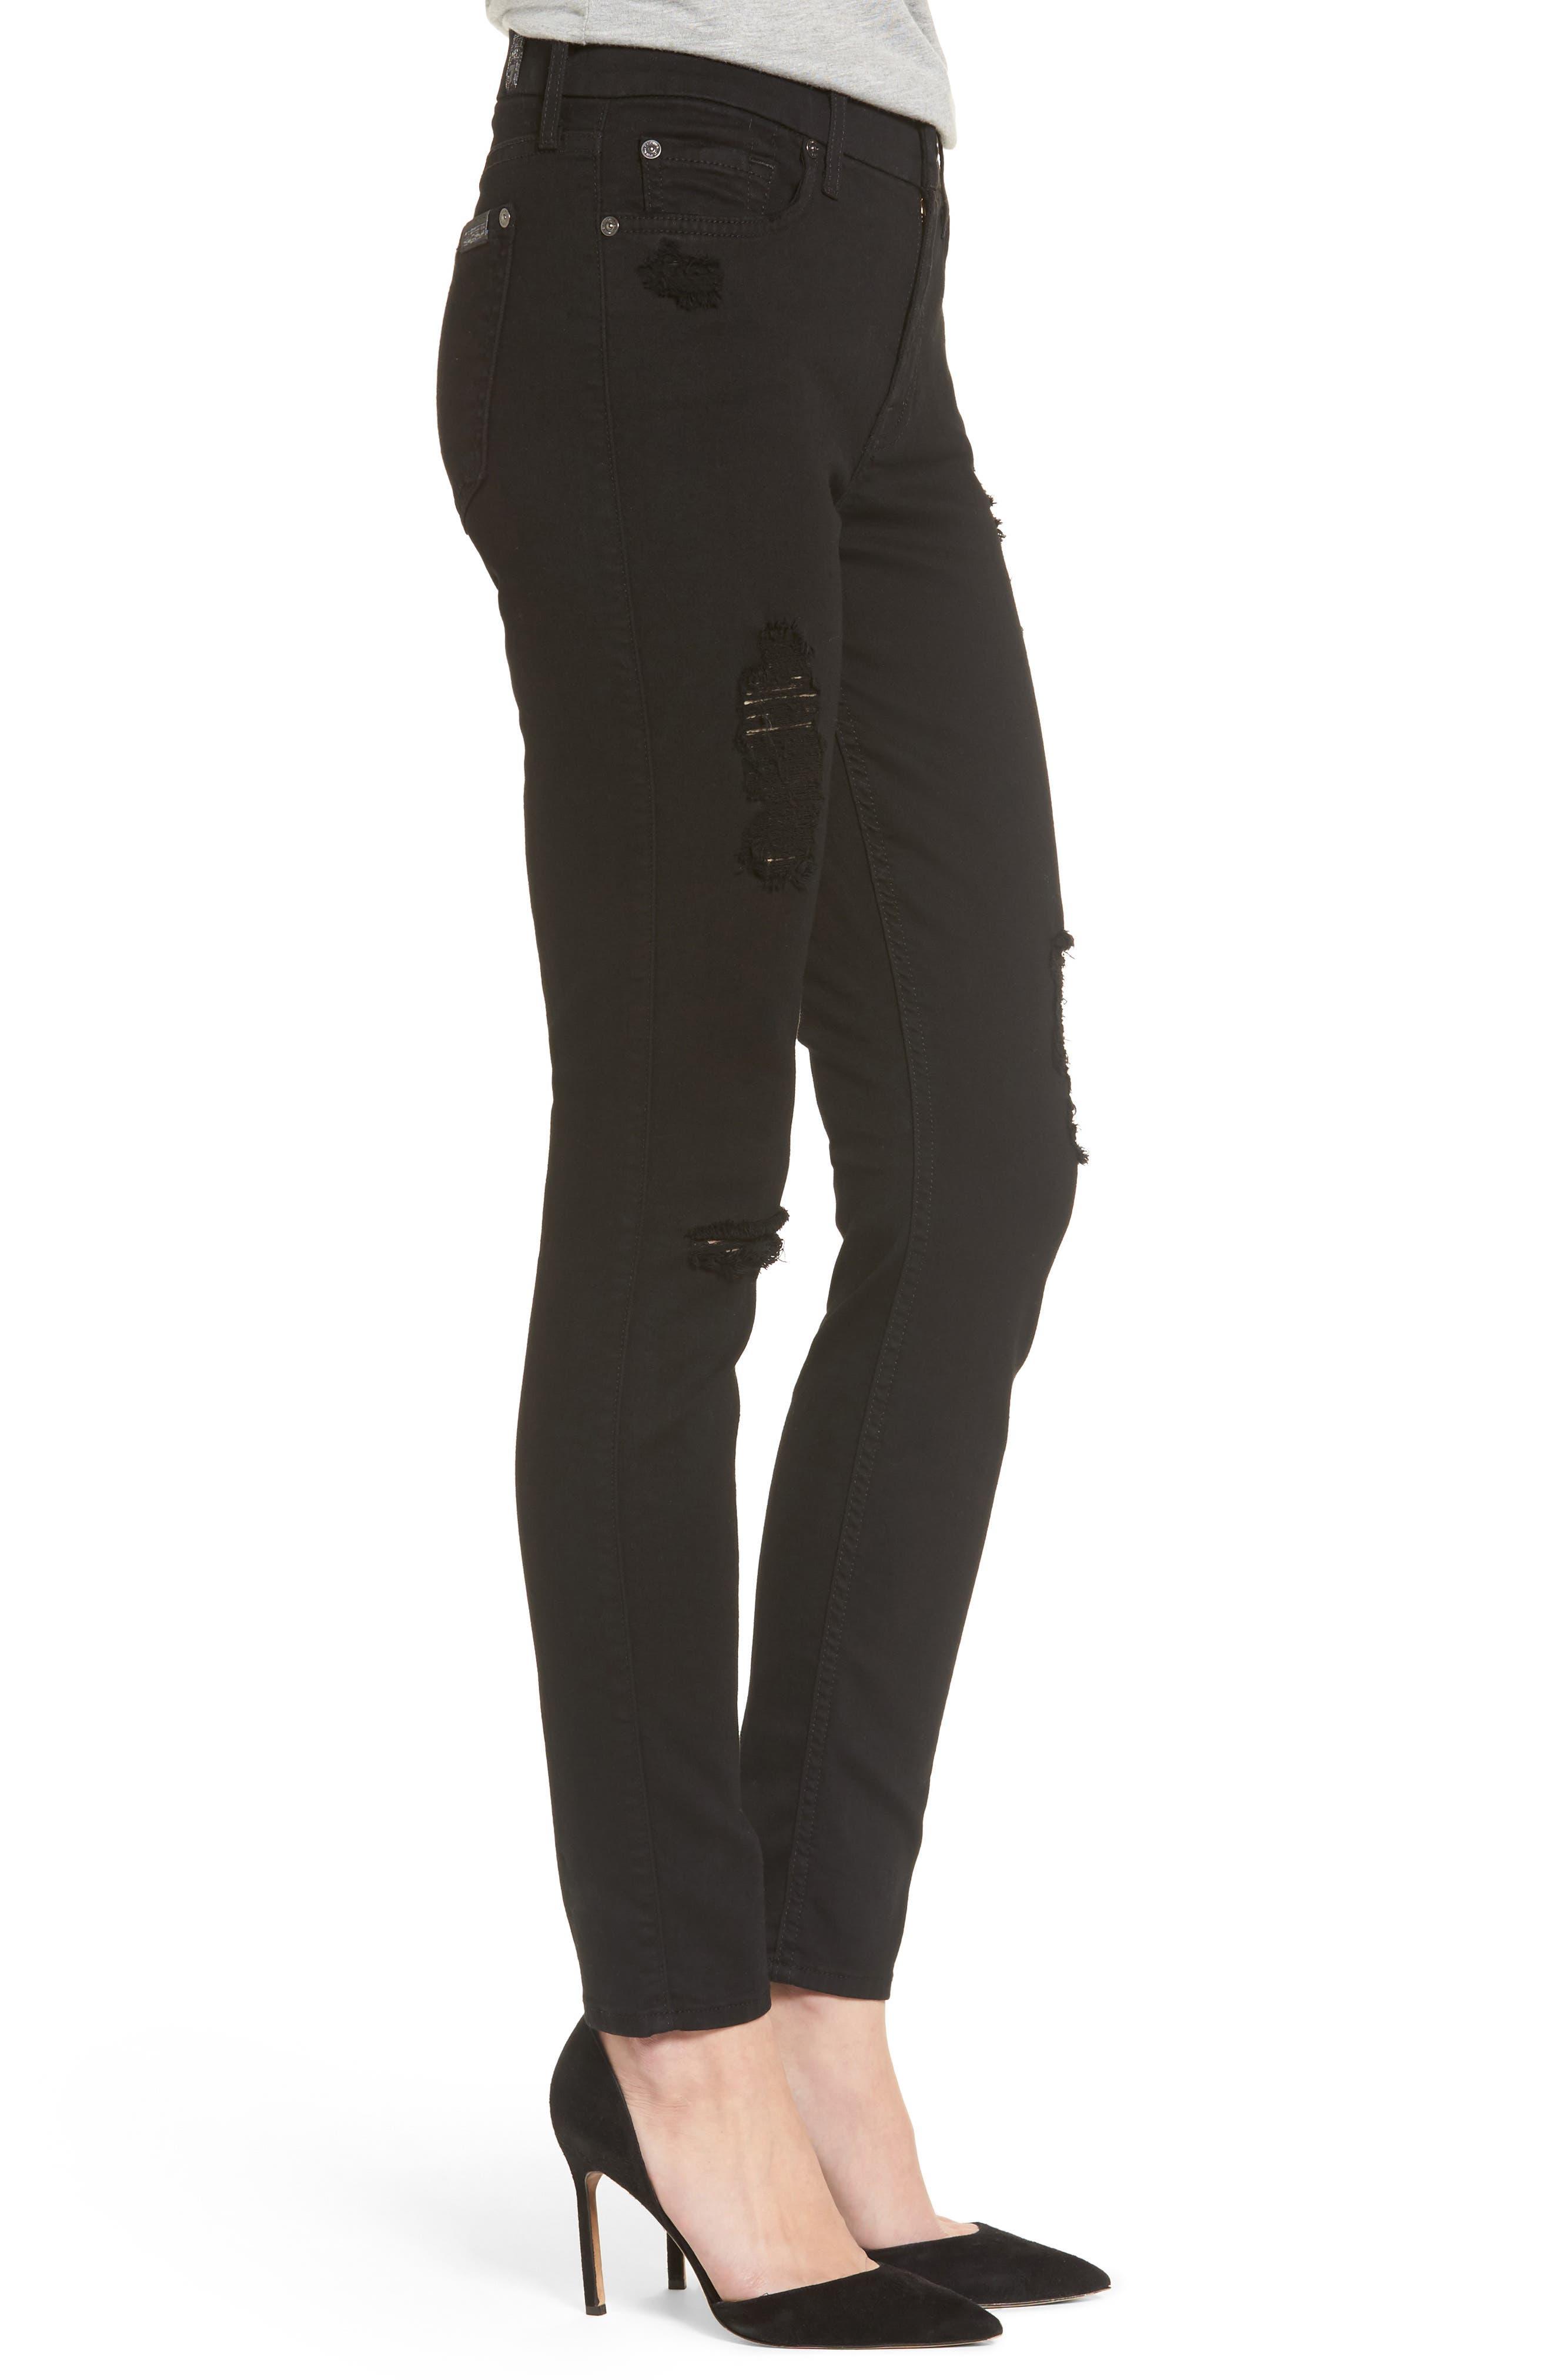 b(air) Ankle Skinny Jeans,                             Alternate thumbnail 3, color,                             BAIR BLACK 3